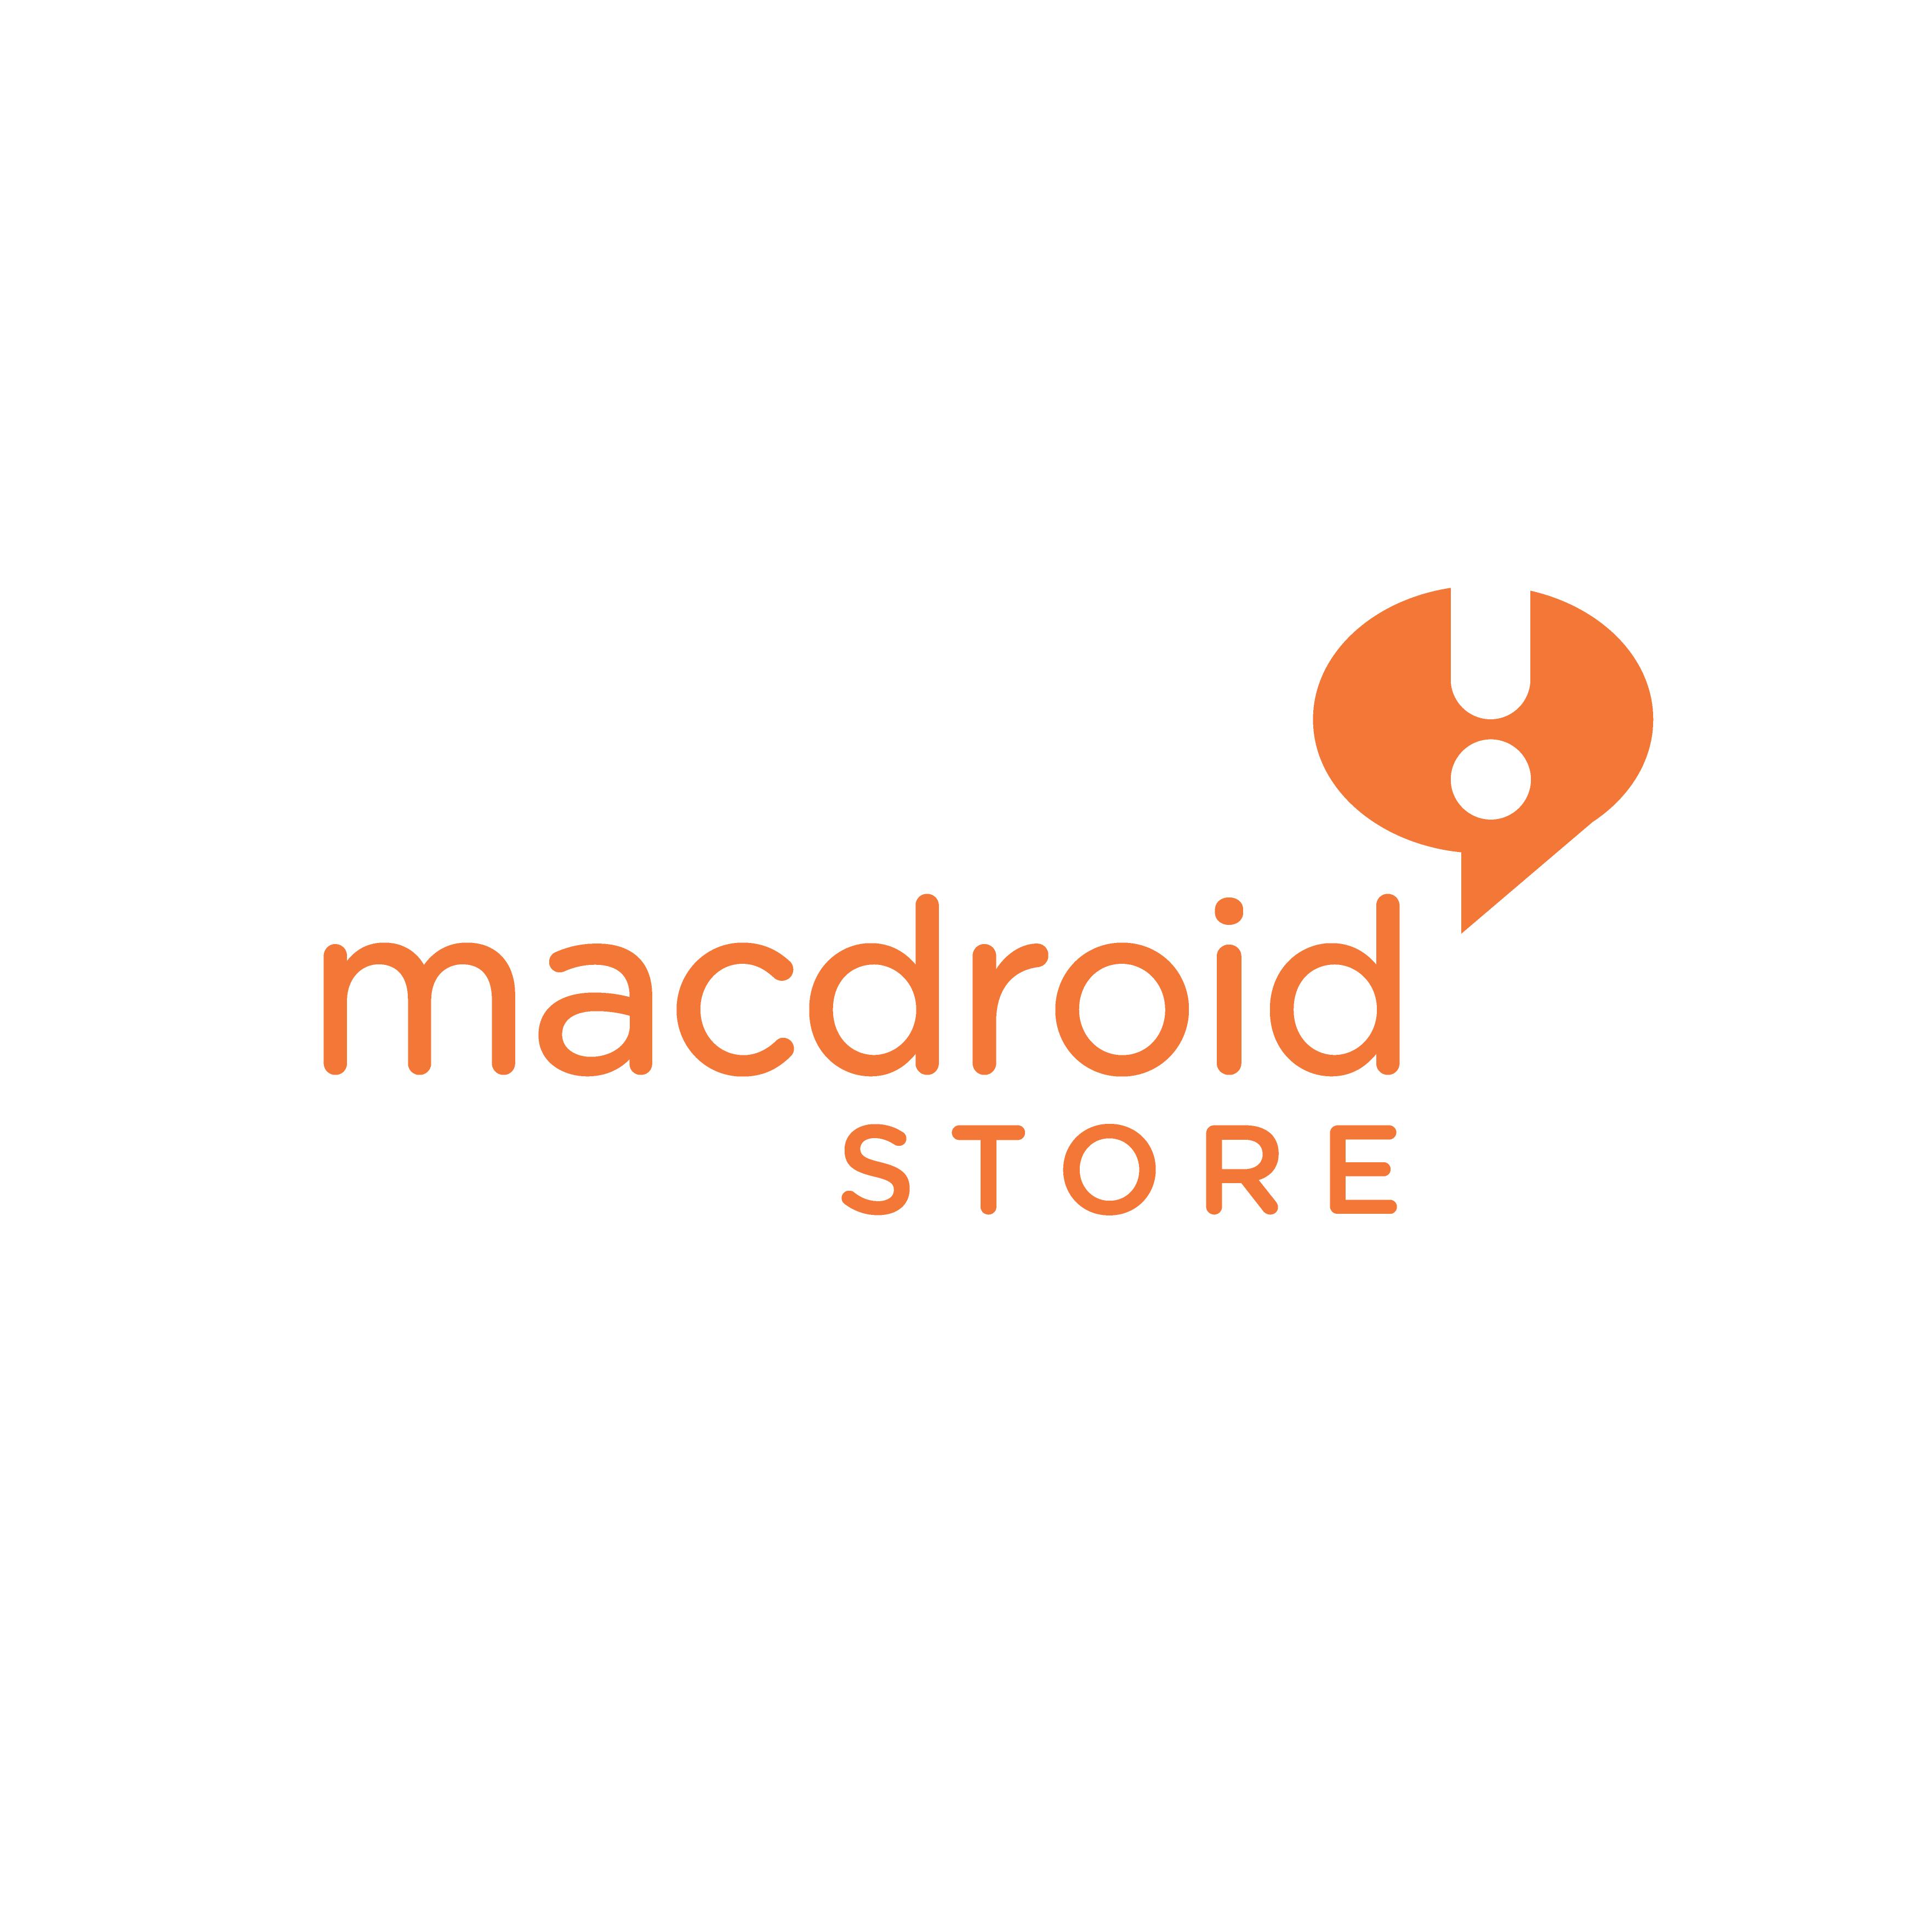 Macdroid Store